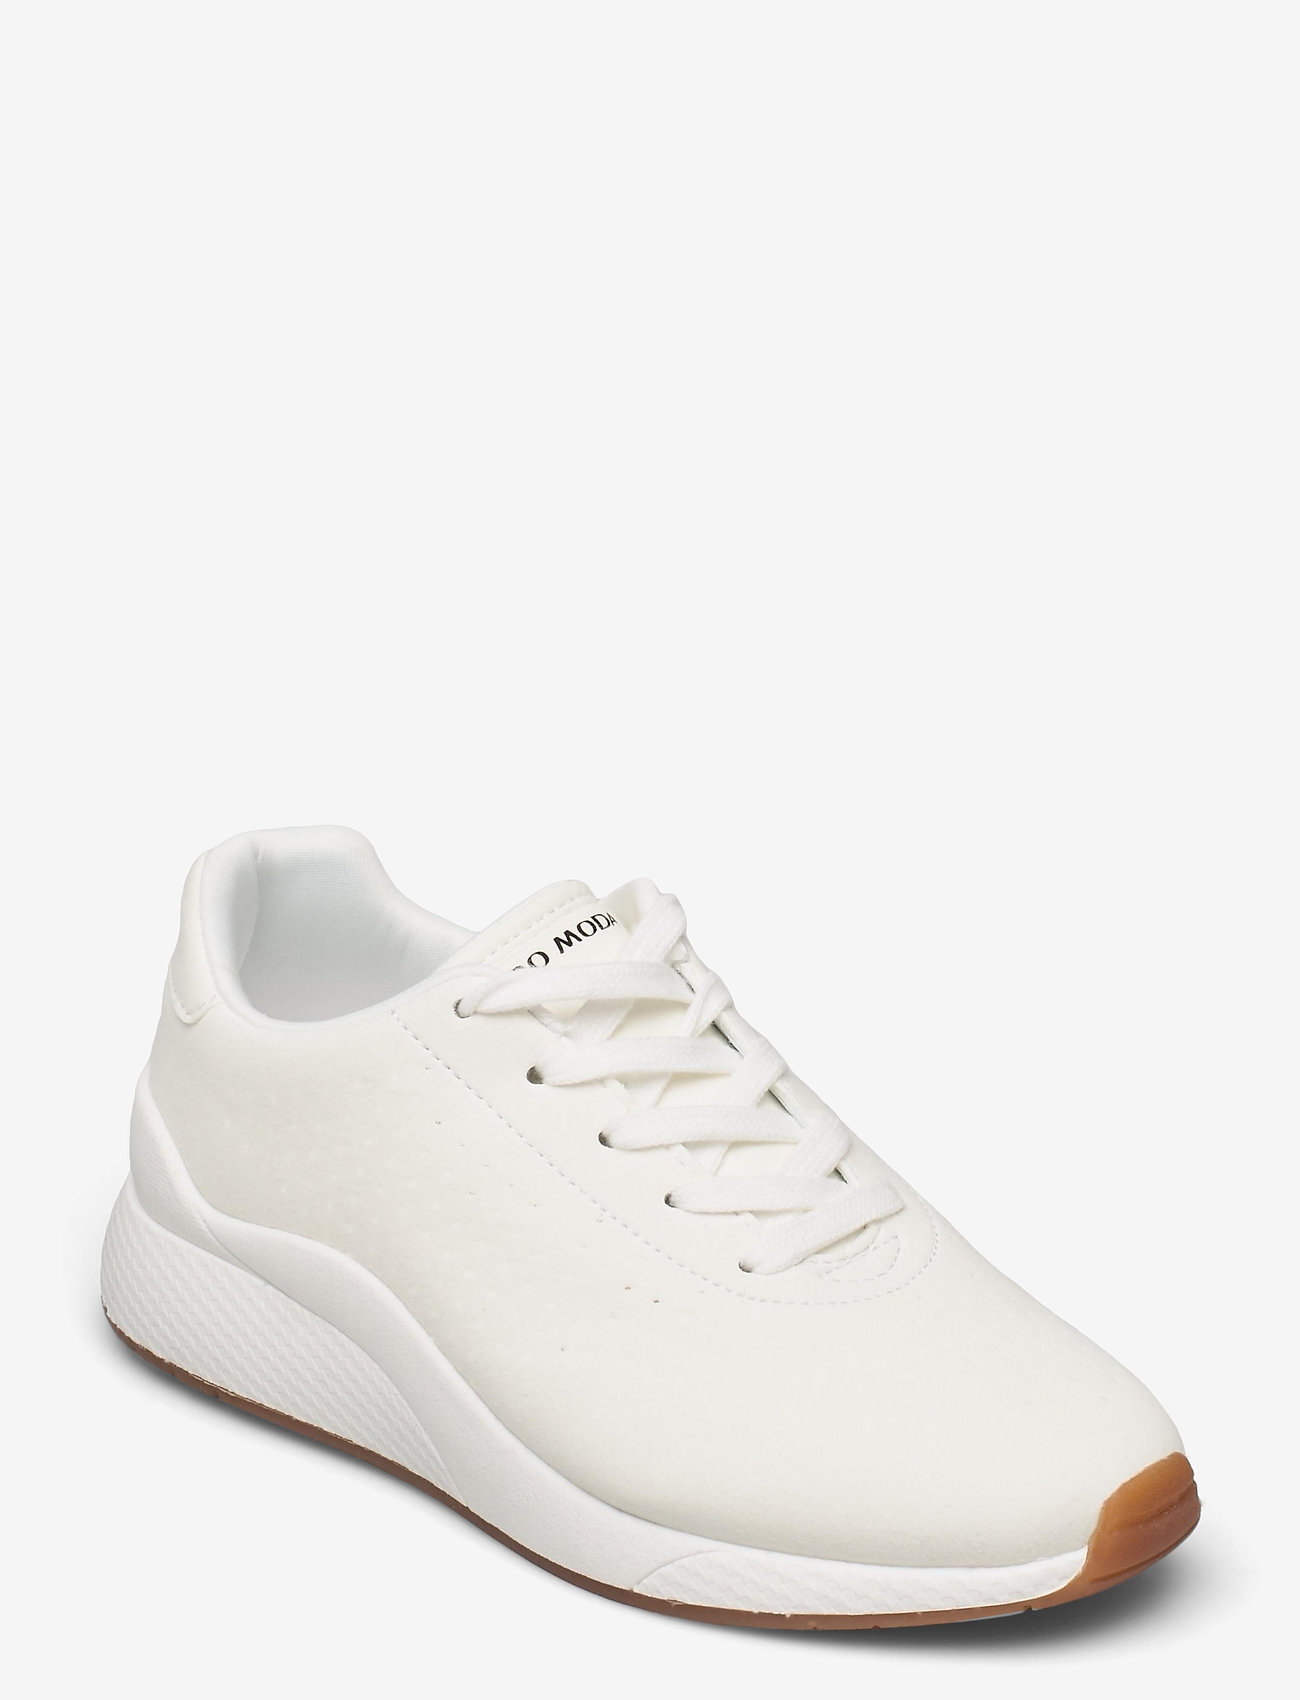 Vero Moda - VMMANAMO SNEAKER - låga sneakers - snow white - 0